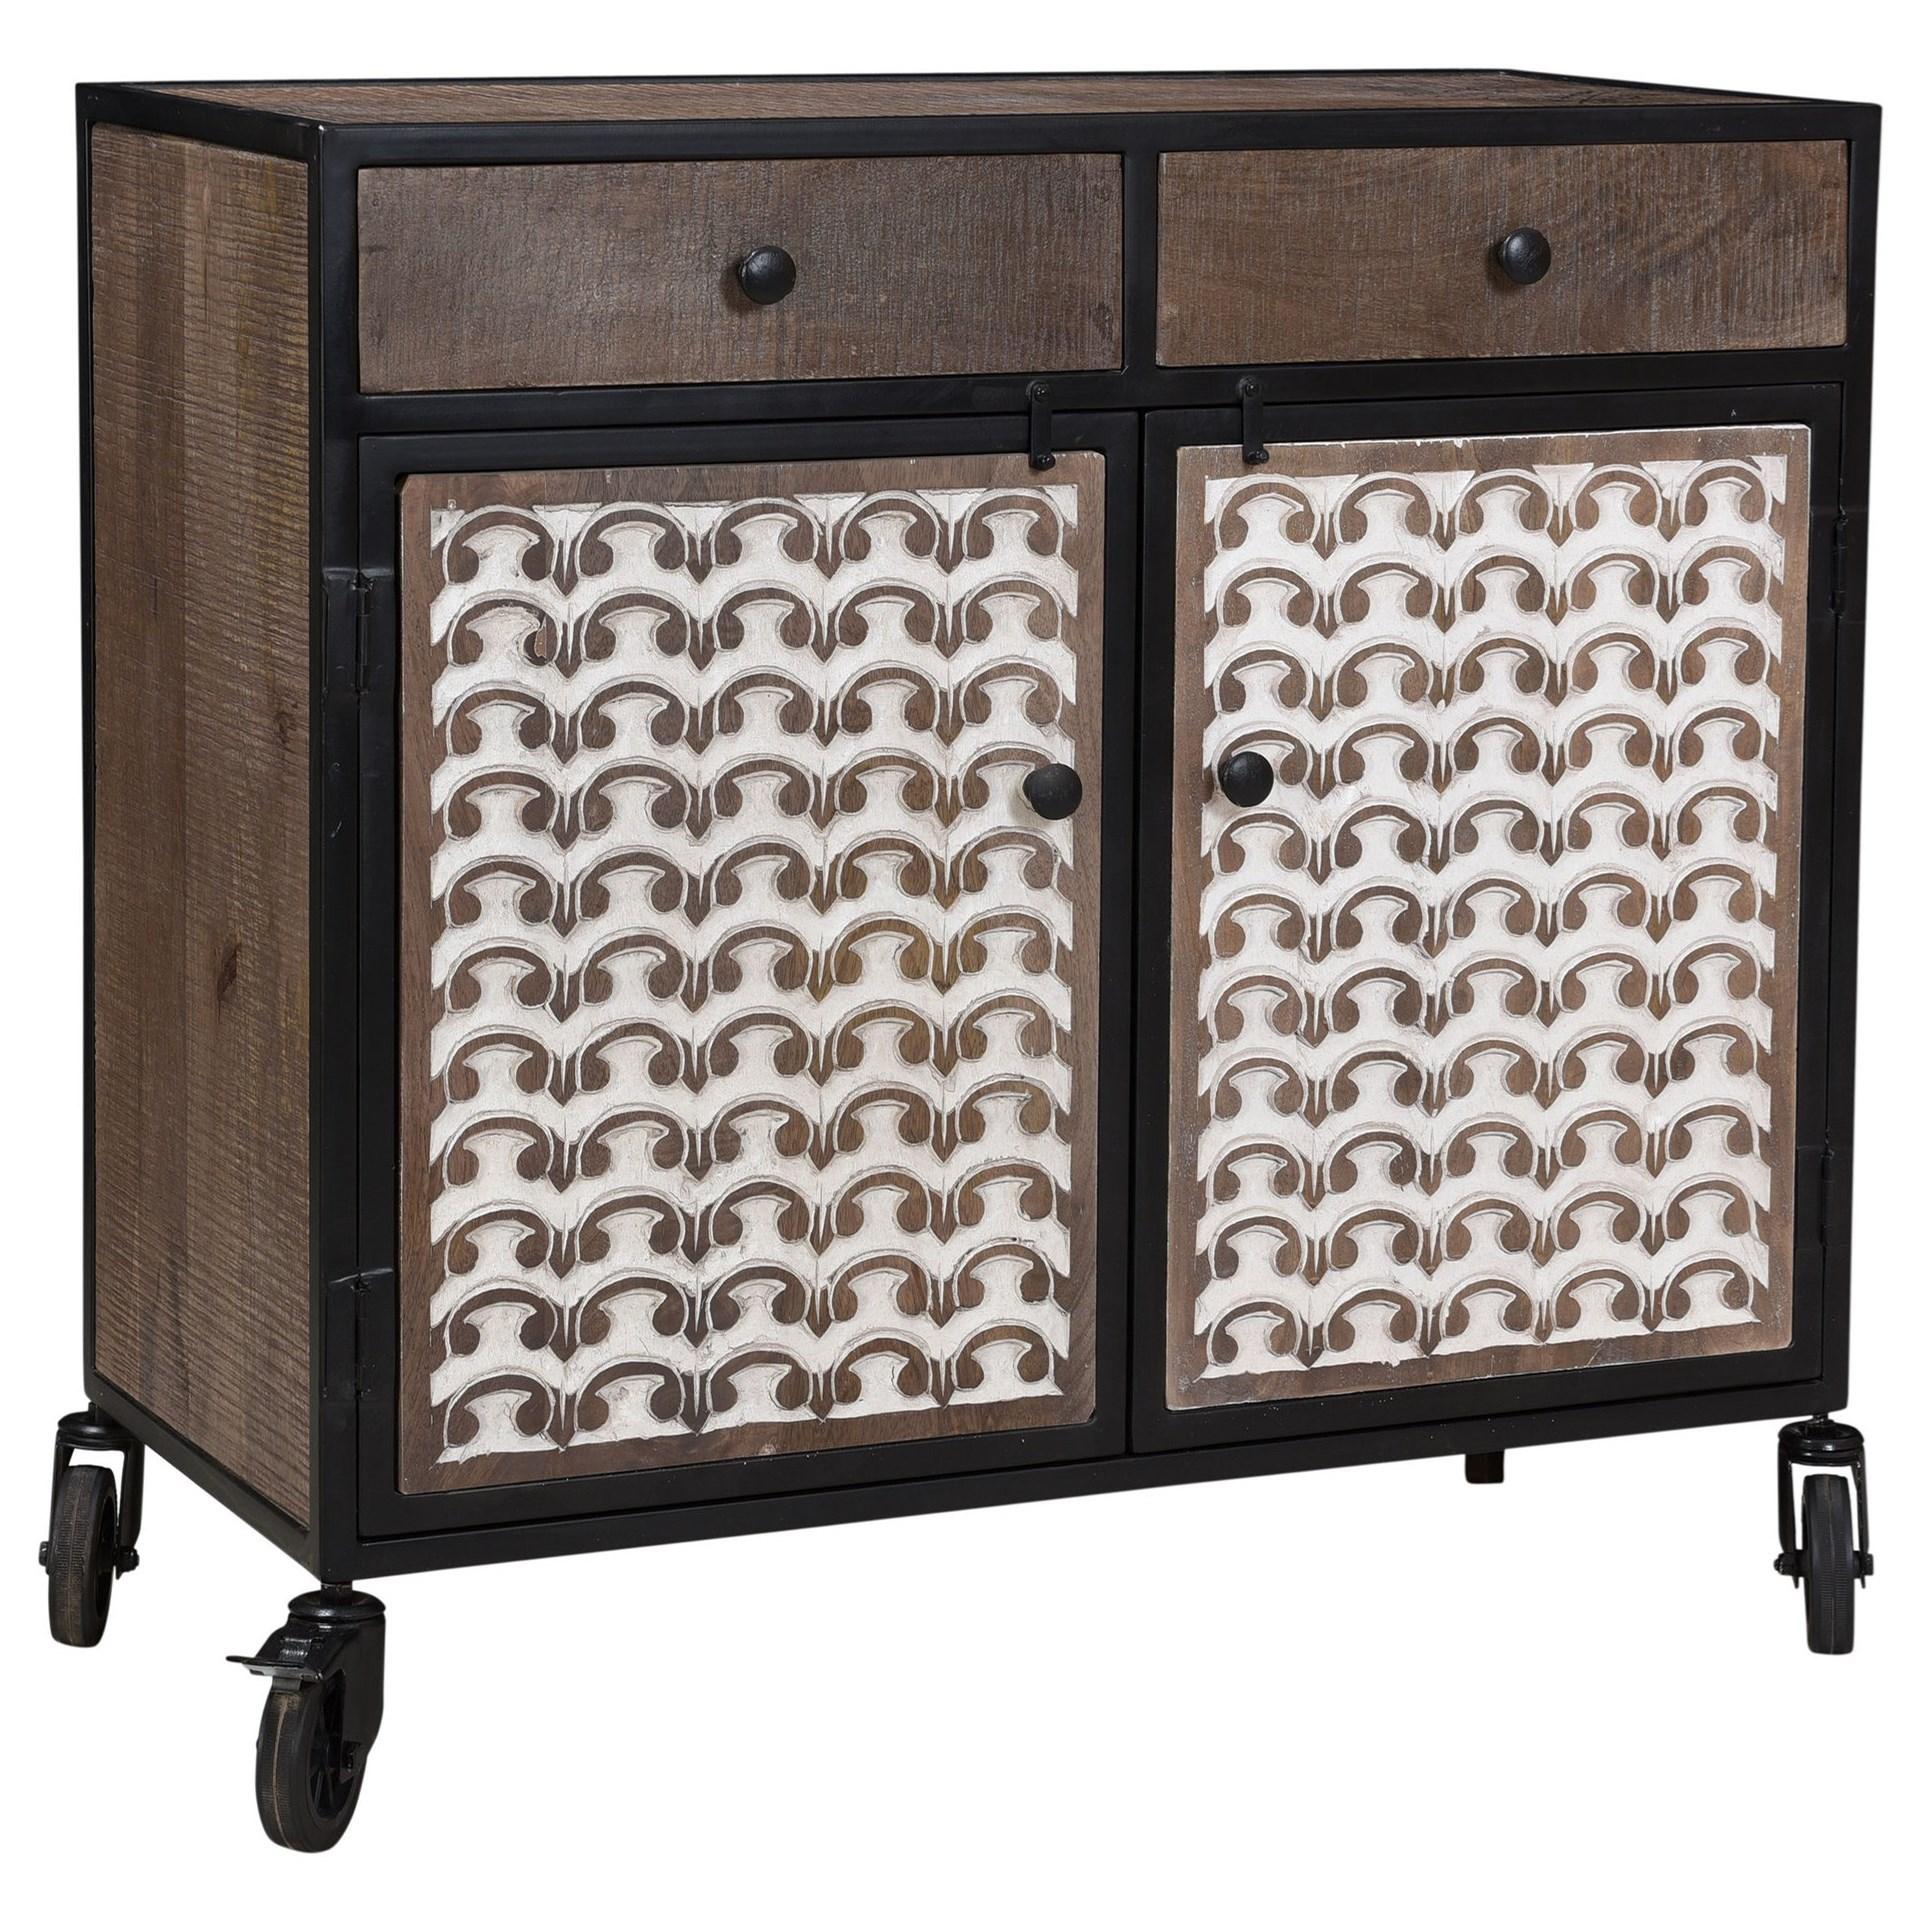 Garrett Accent Cabinet by Steve Silver at Walker's Furniture